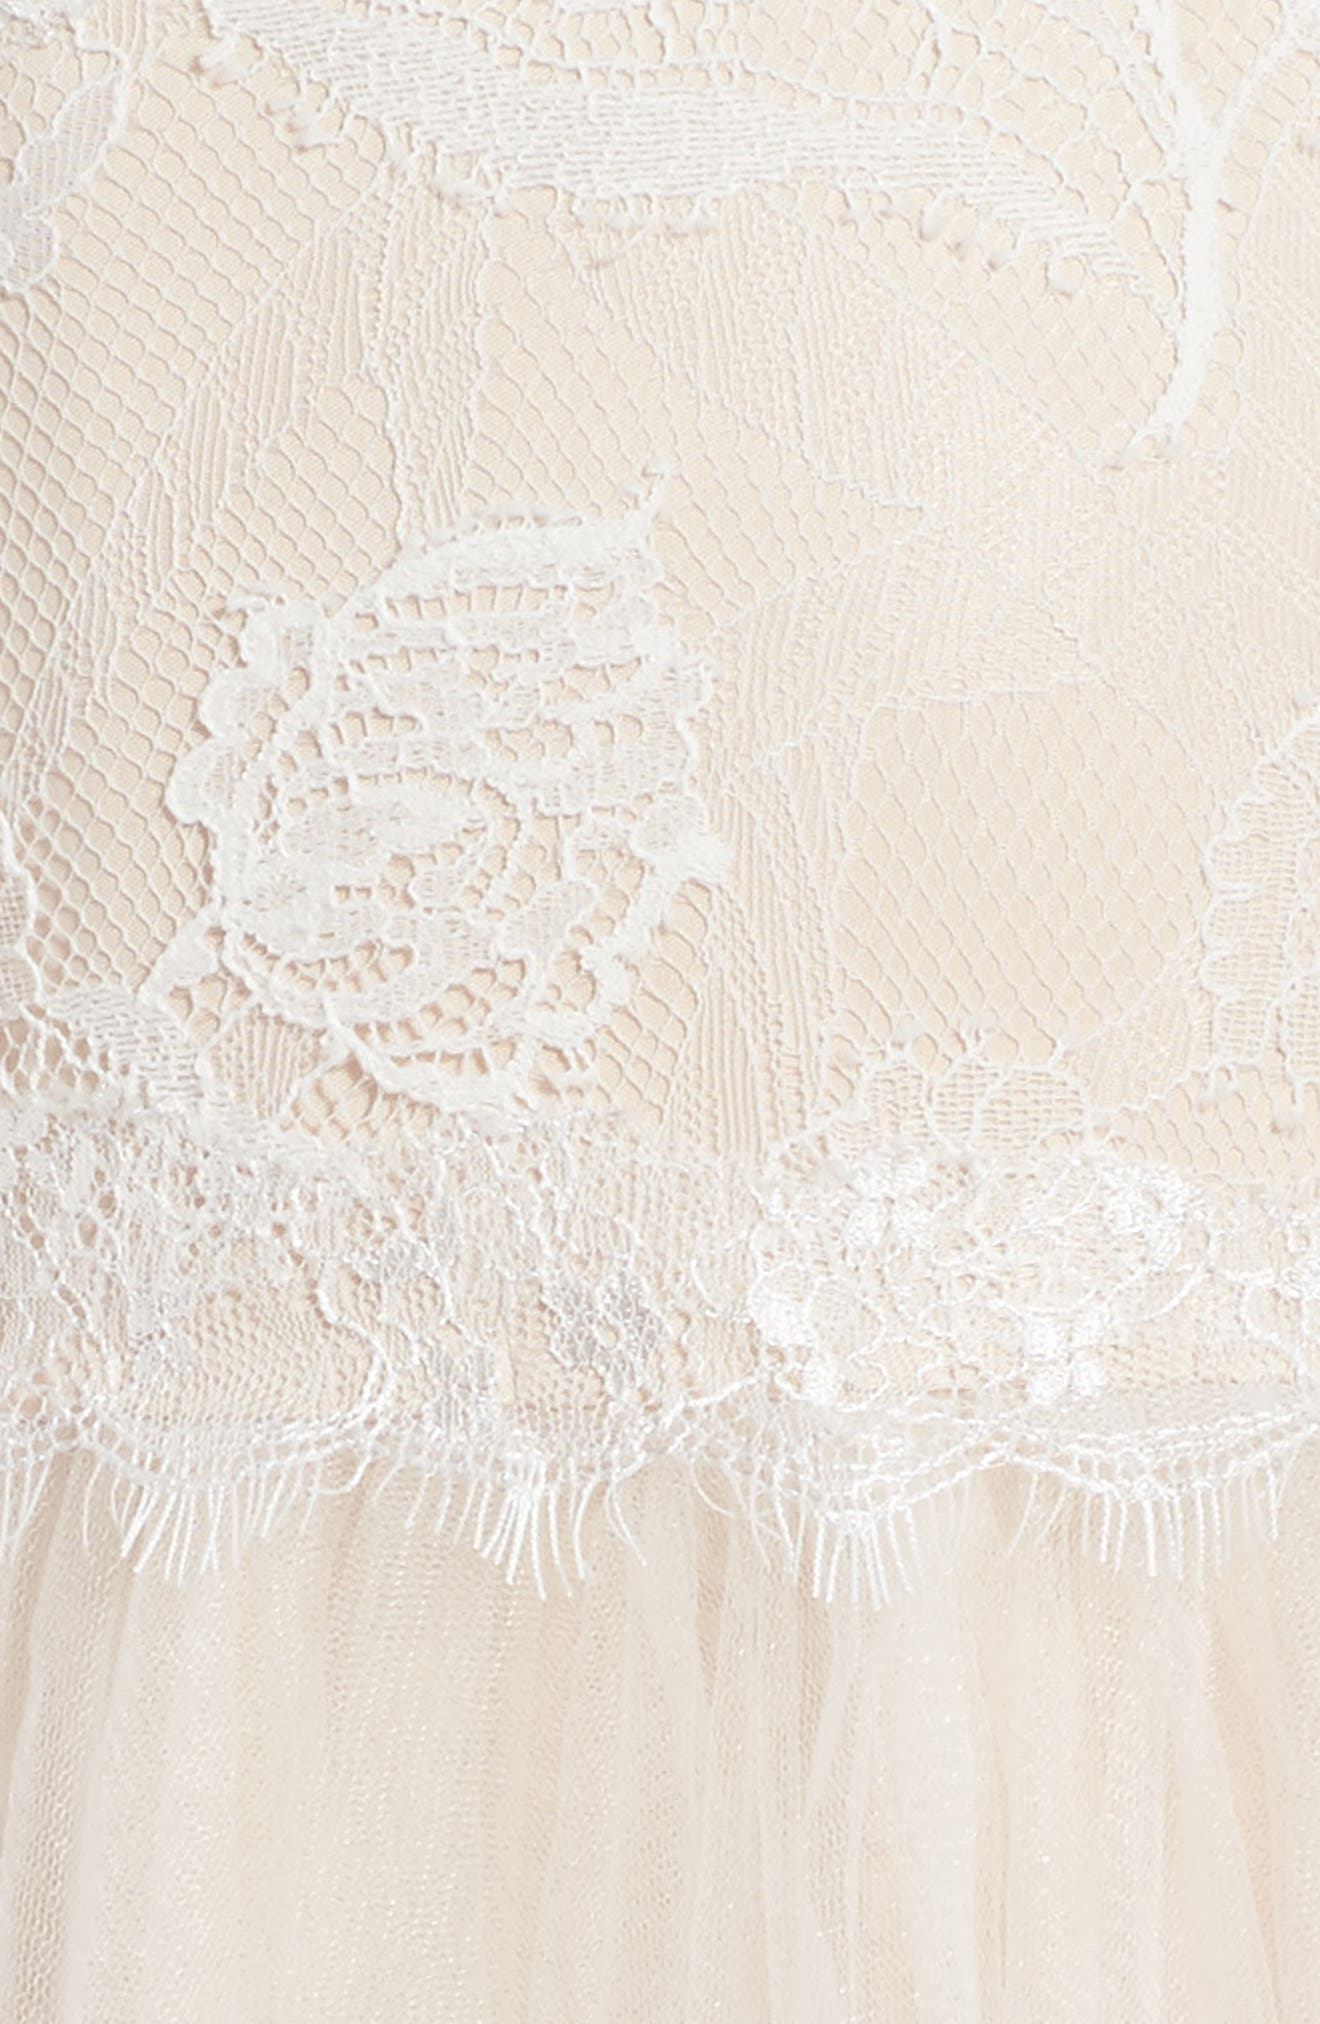 Alternate Image 3  - Tadashi Shoji Sleeveless Lace Dress (Toddler Girls, Little Girls & Big Girls)